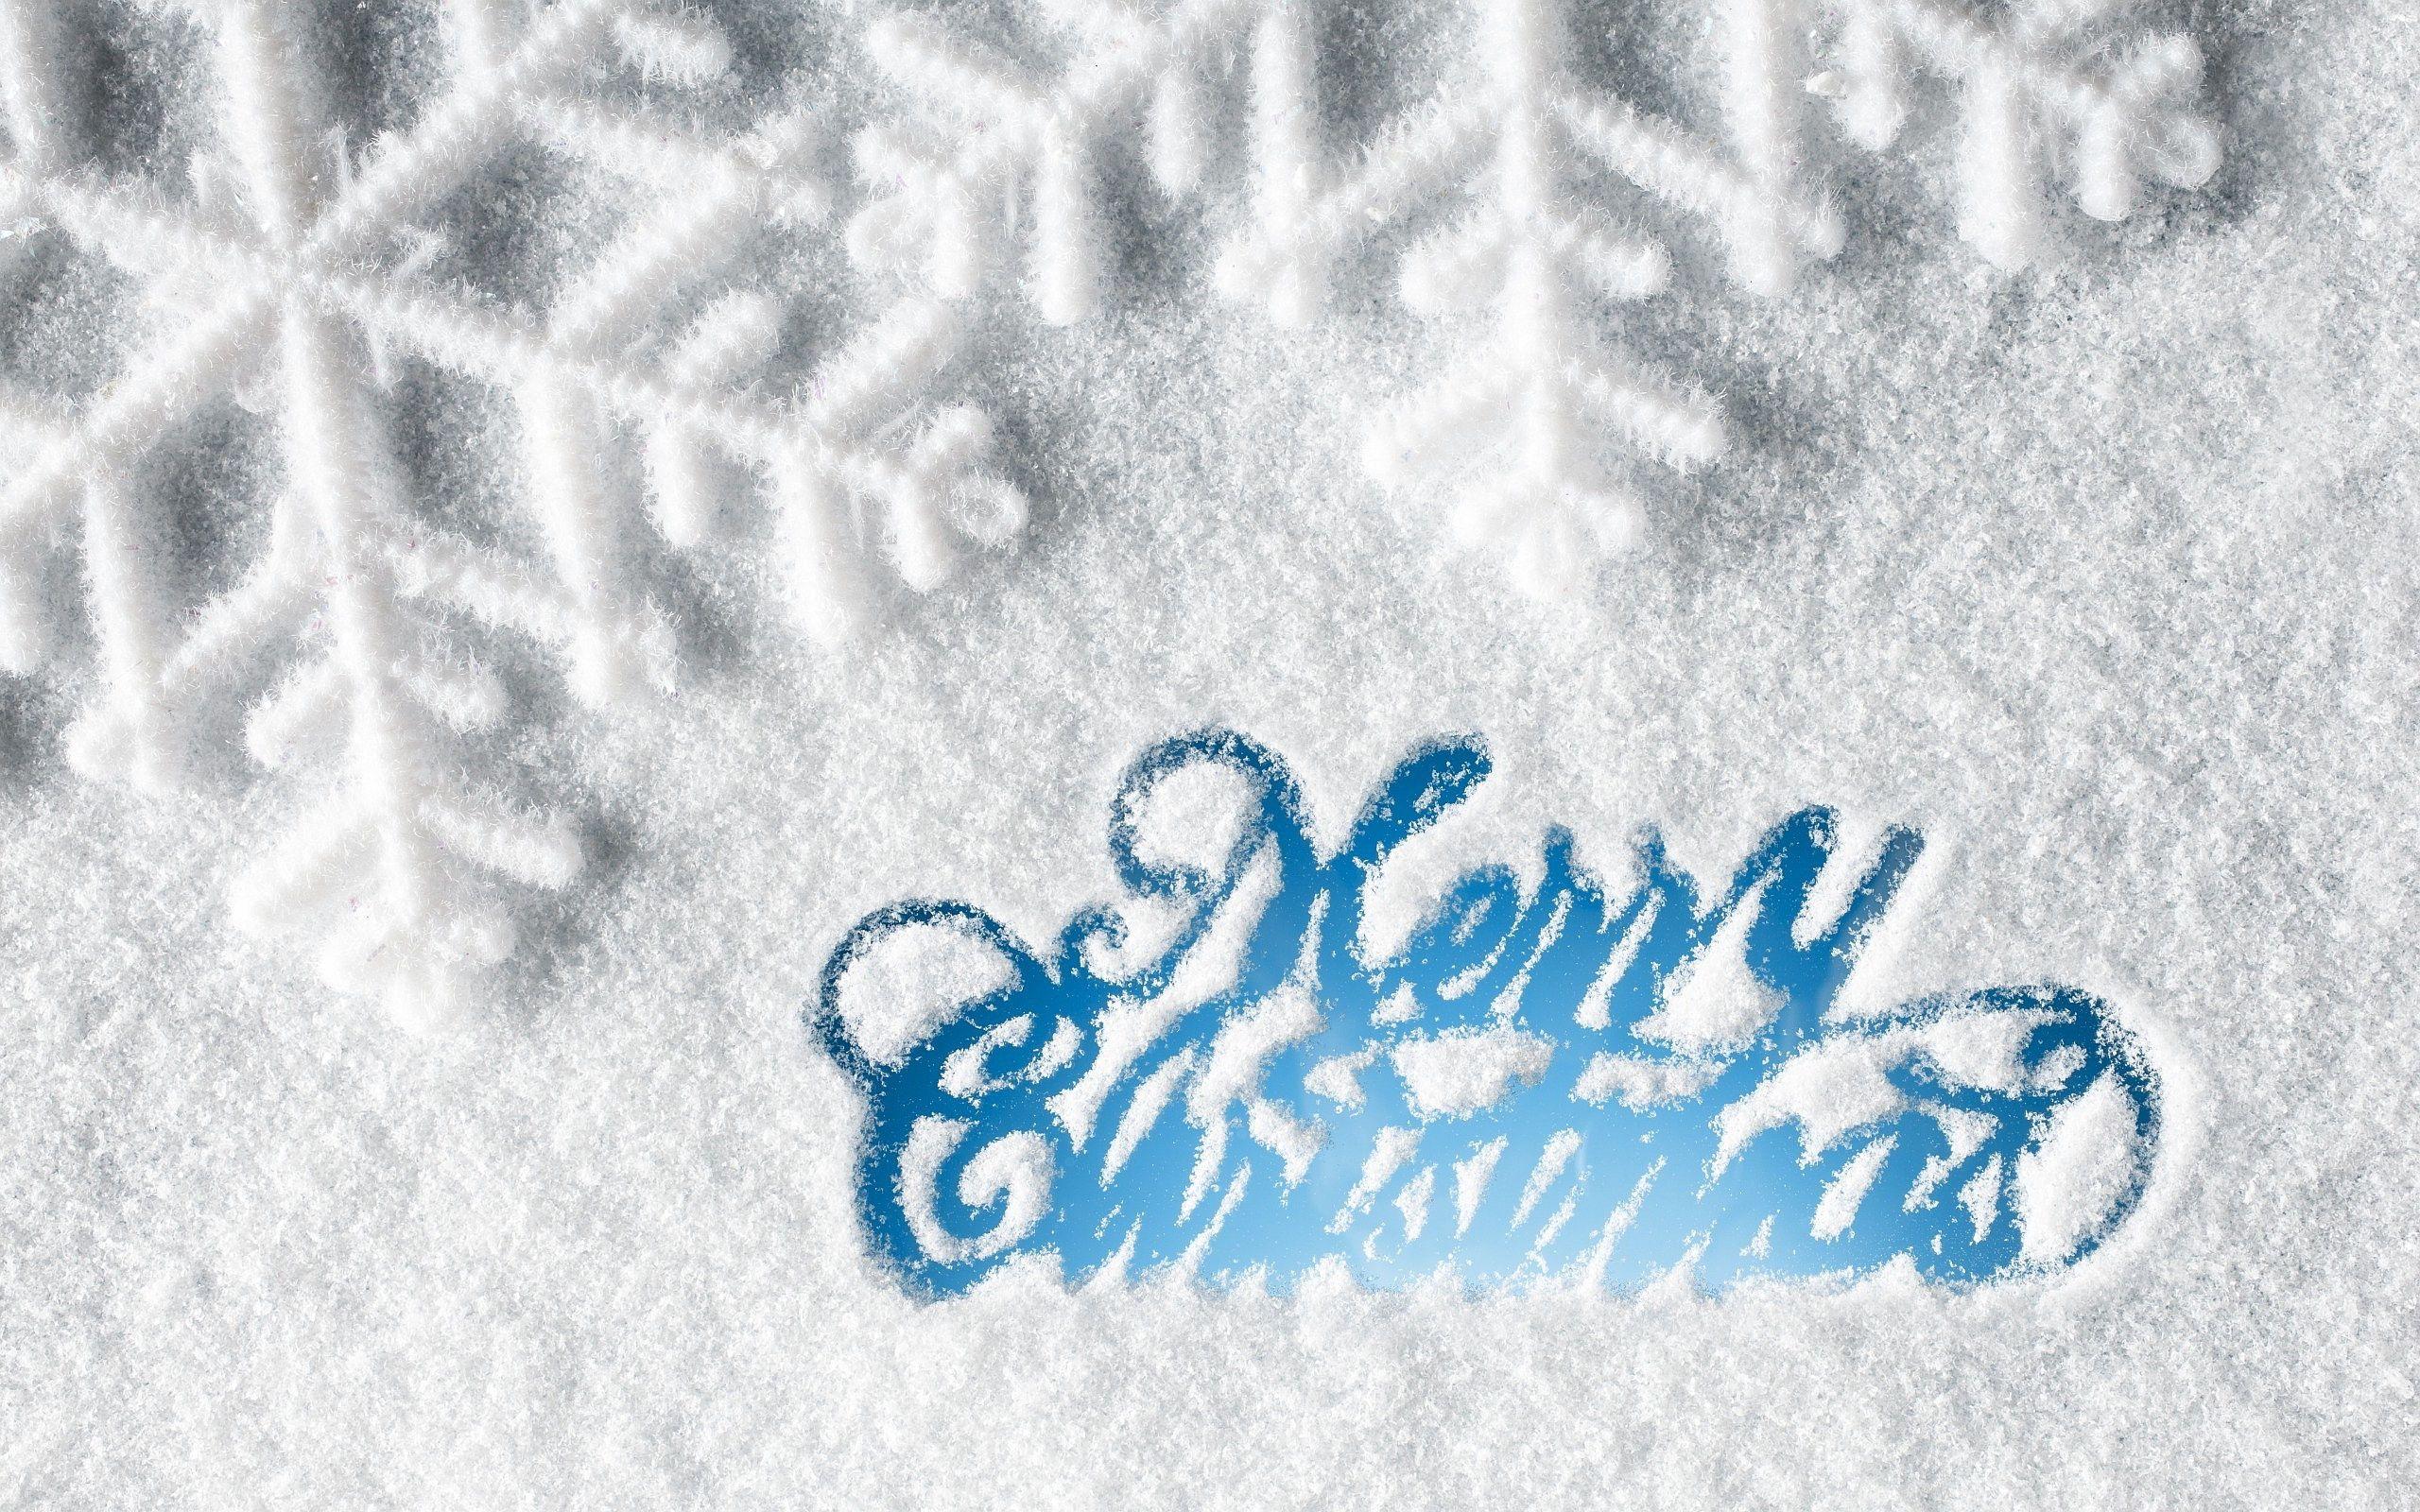 merry christmas wallpaper hd. wallpaper merry christmas hd